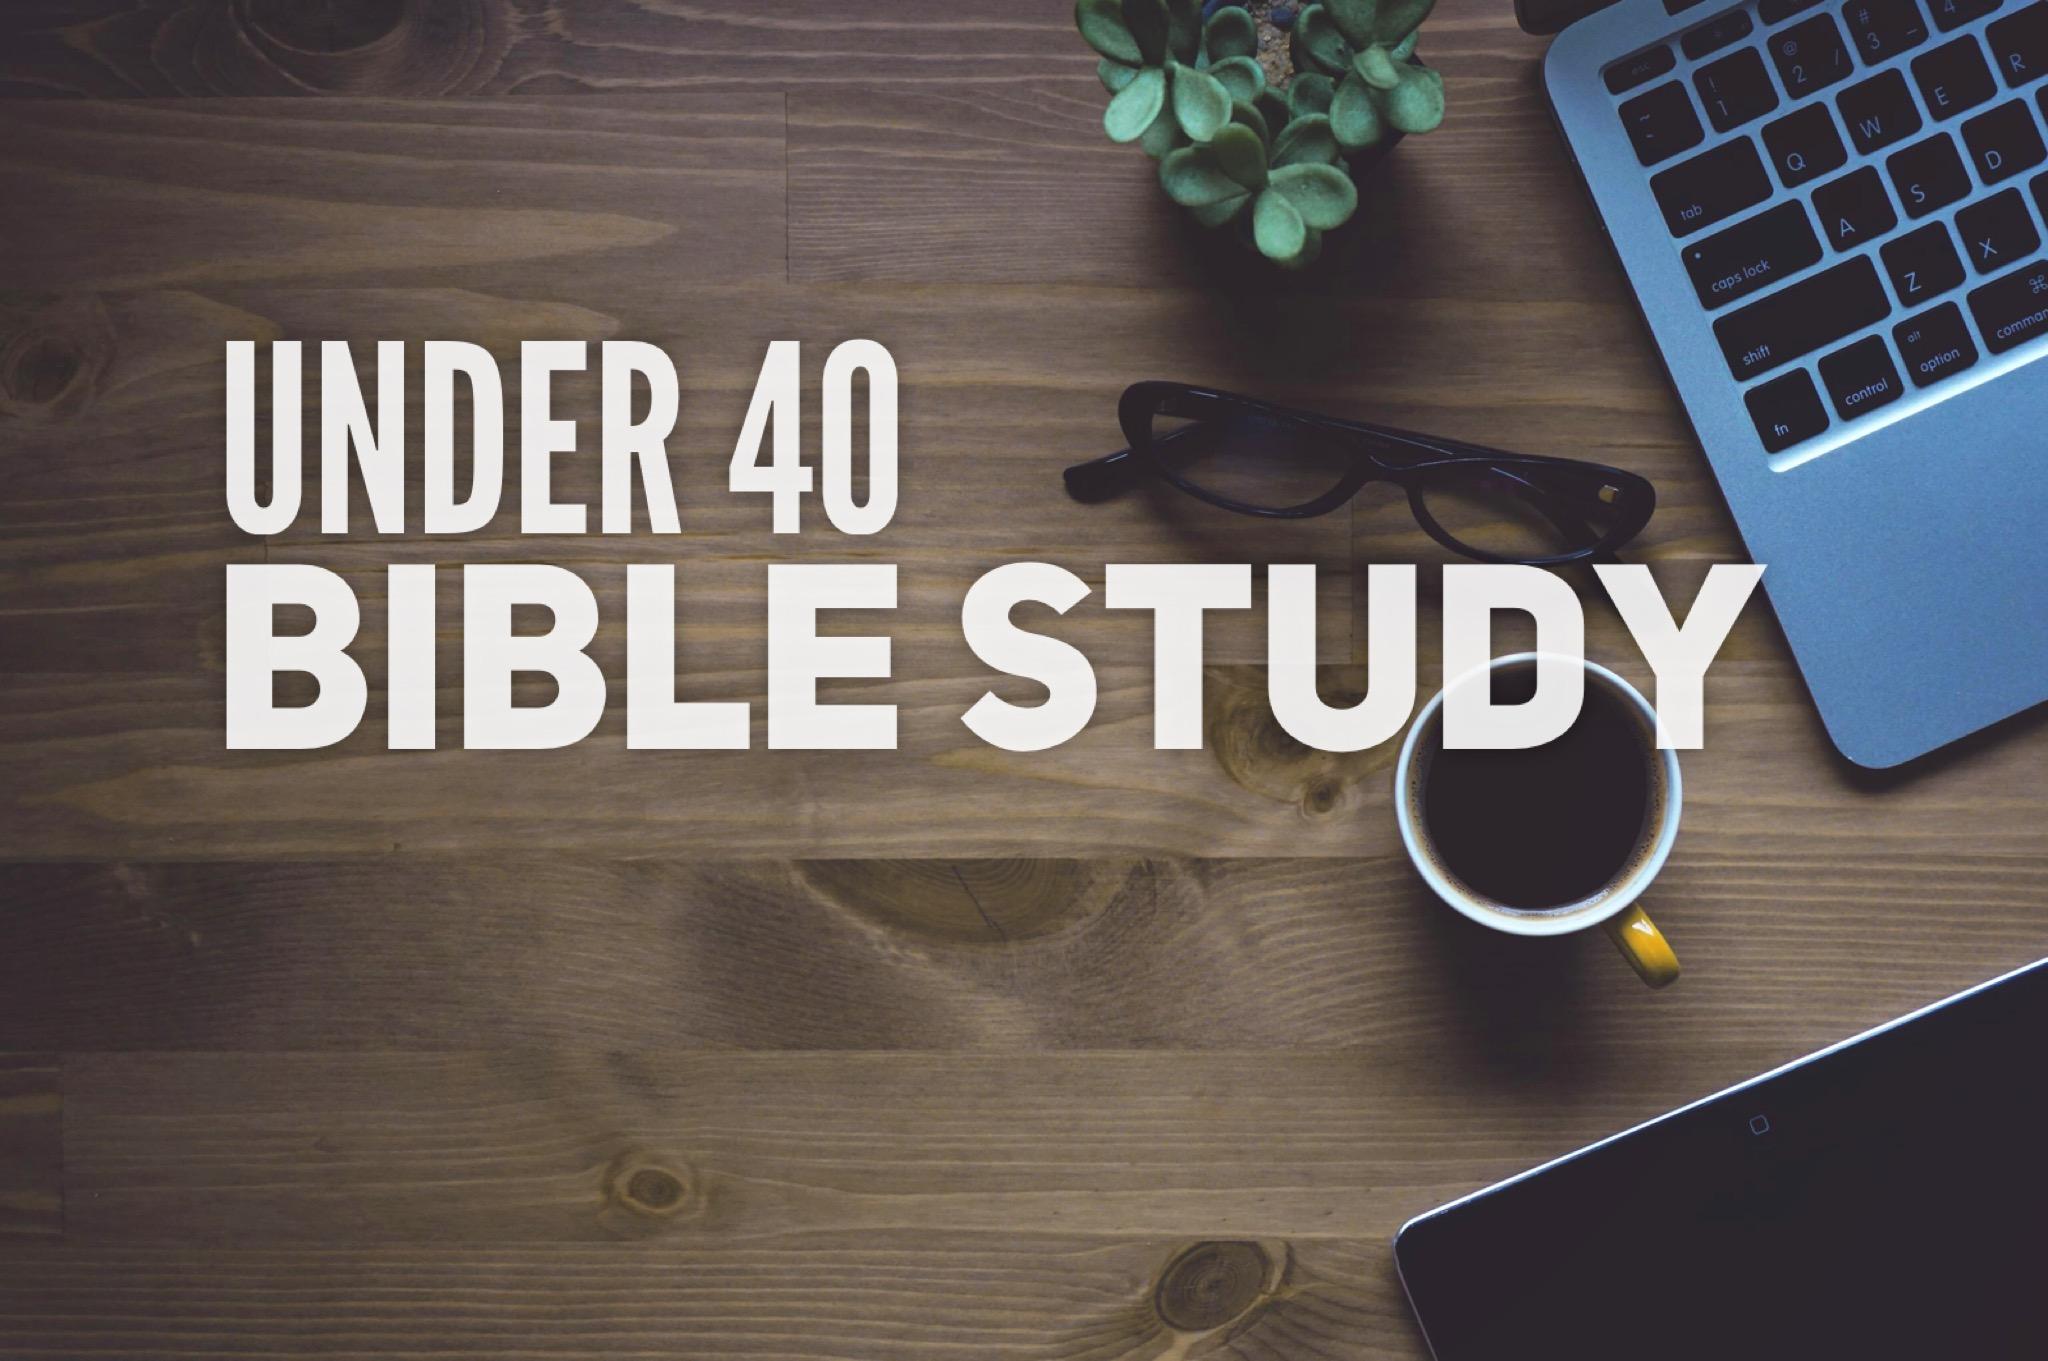 Under 40's Bible Study Pic.jpg